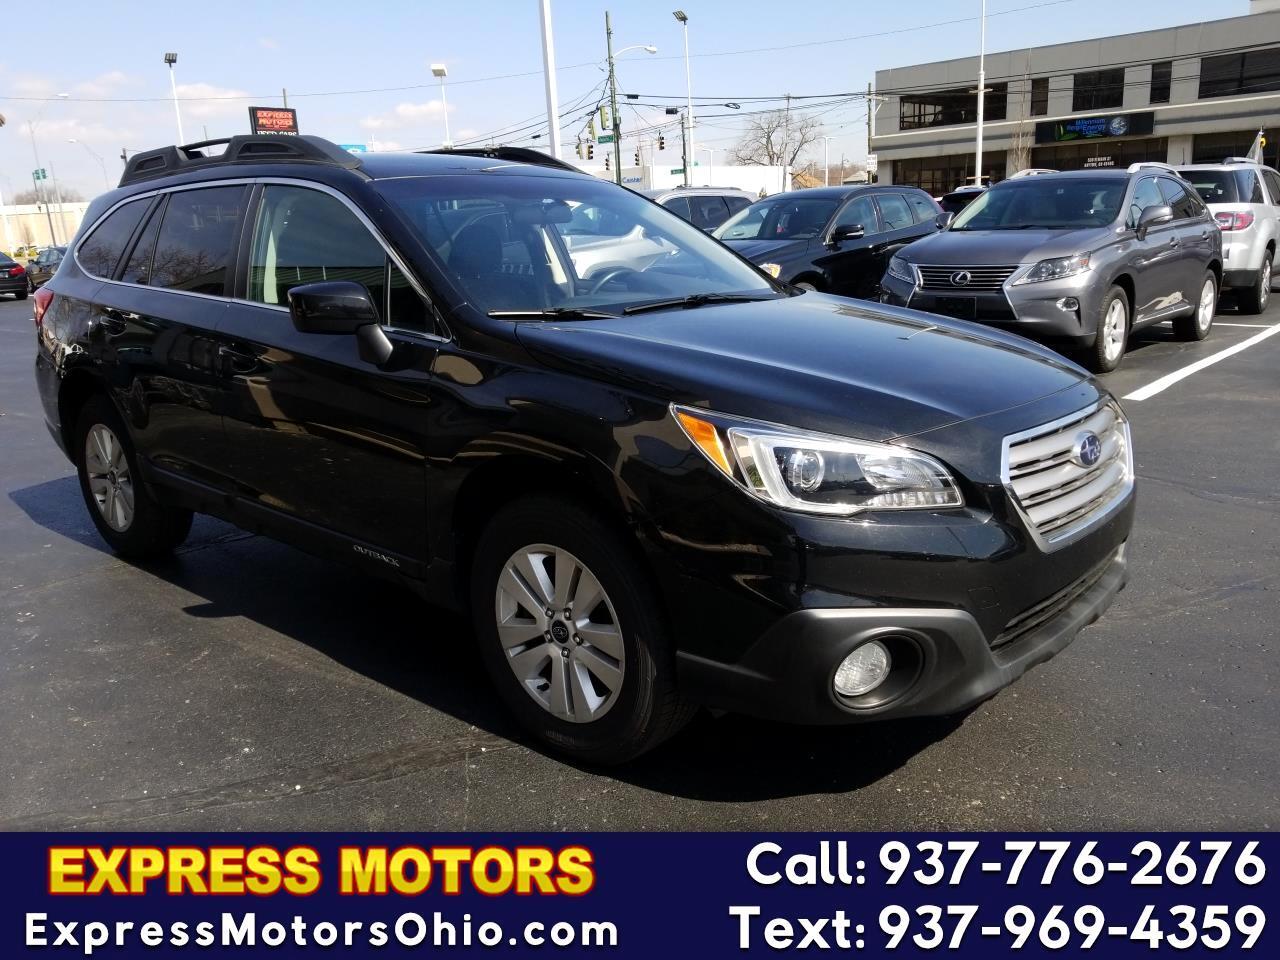 Subaru Of Dayton >> Used 2015 Subaru Outback For Sale In Dayton Oh 45405 Express Motors